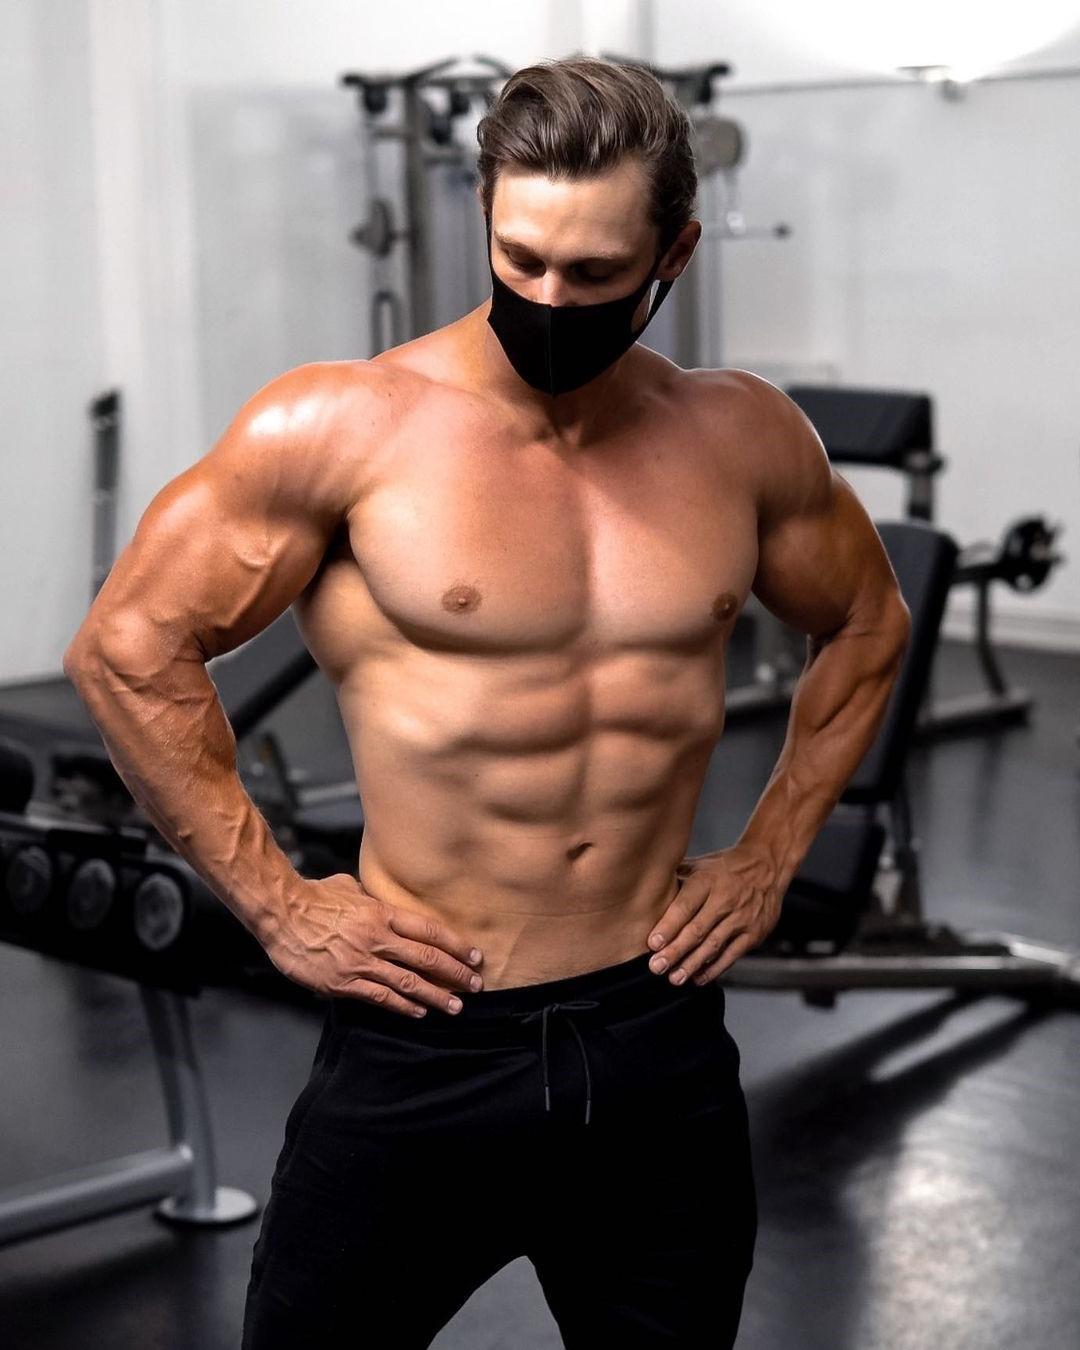 gym-hunk-steve-kris-shirtless-body-face-mask-veiny-arms